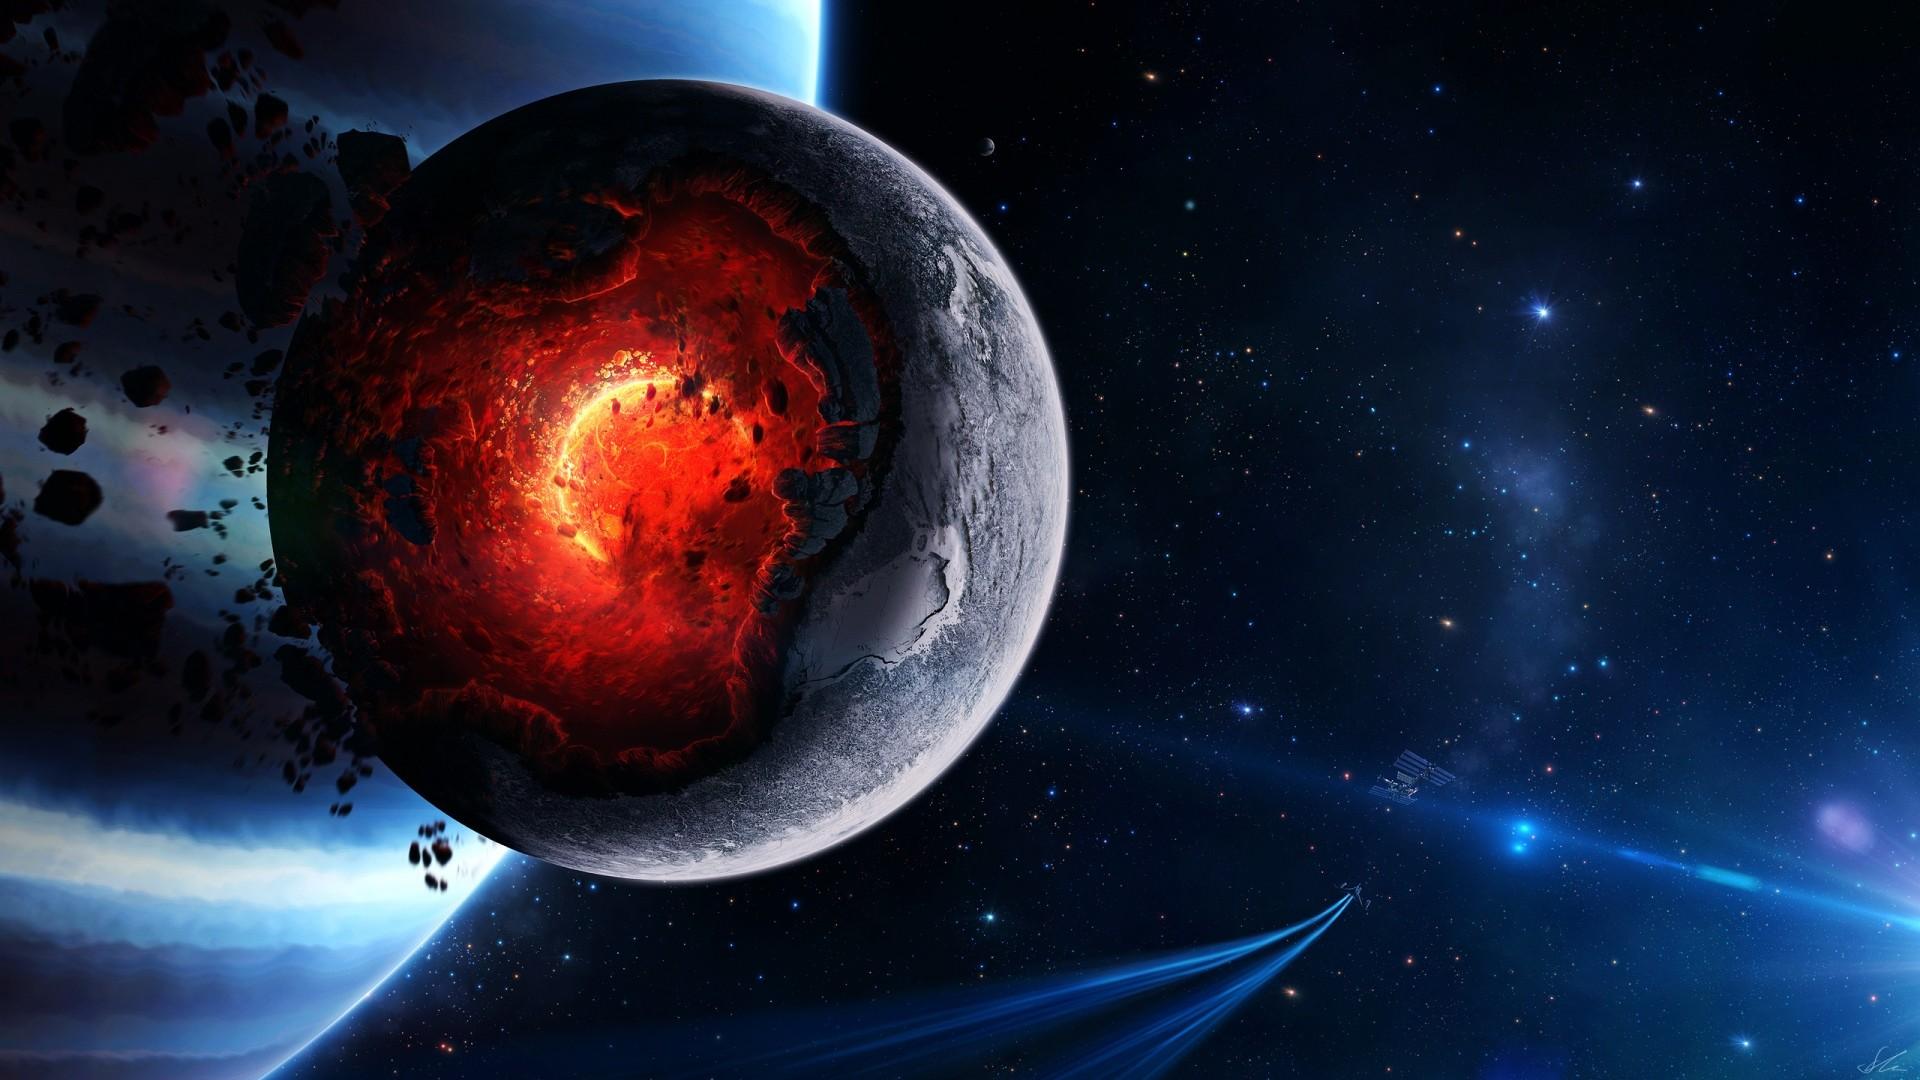 Preview wallpaper space, cataclysm, planet, art, explosion, asteroids,  comets,